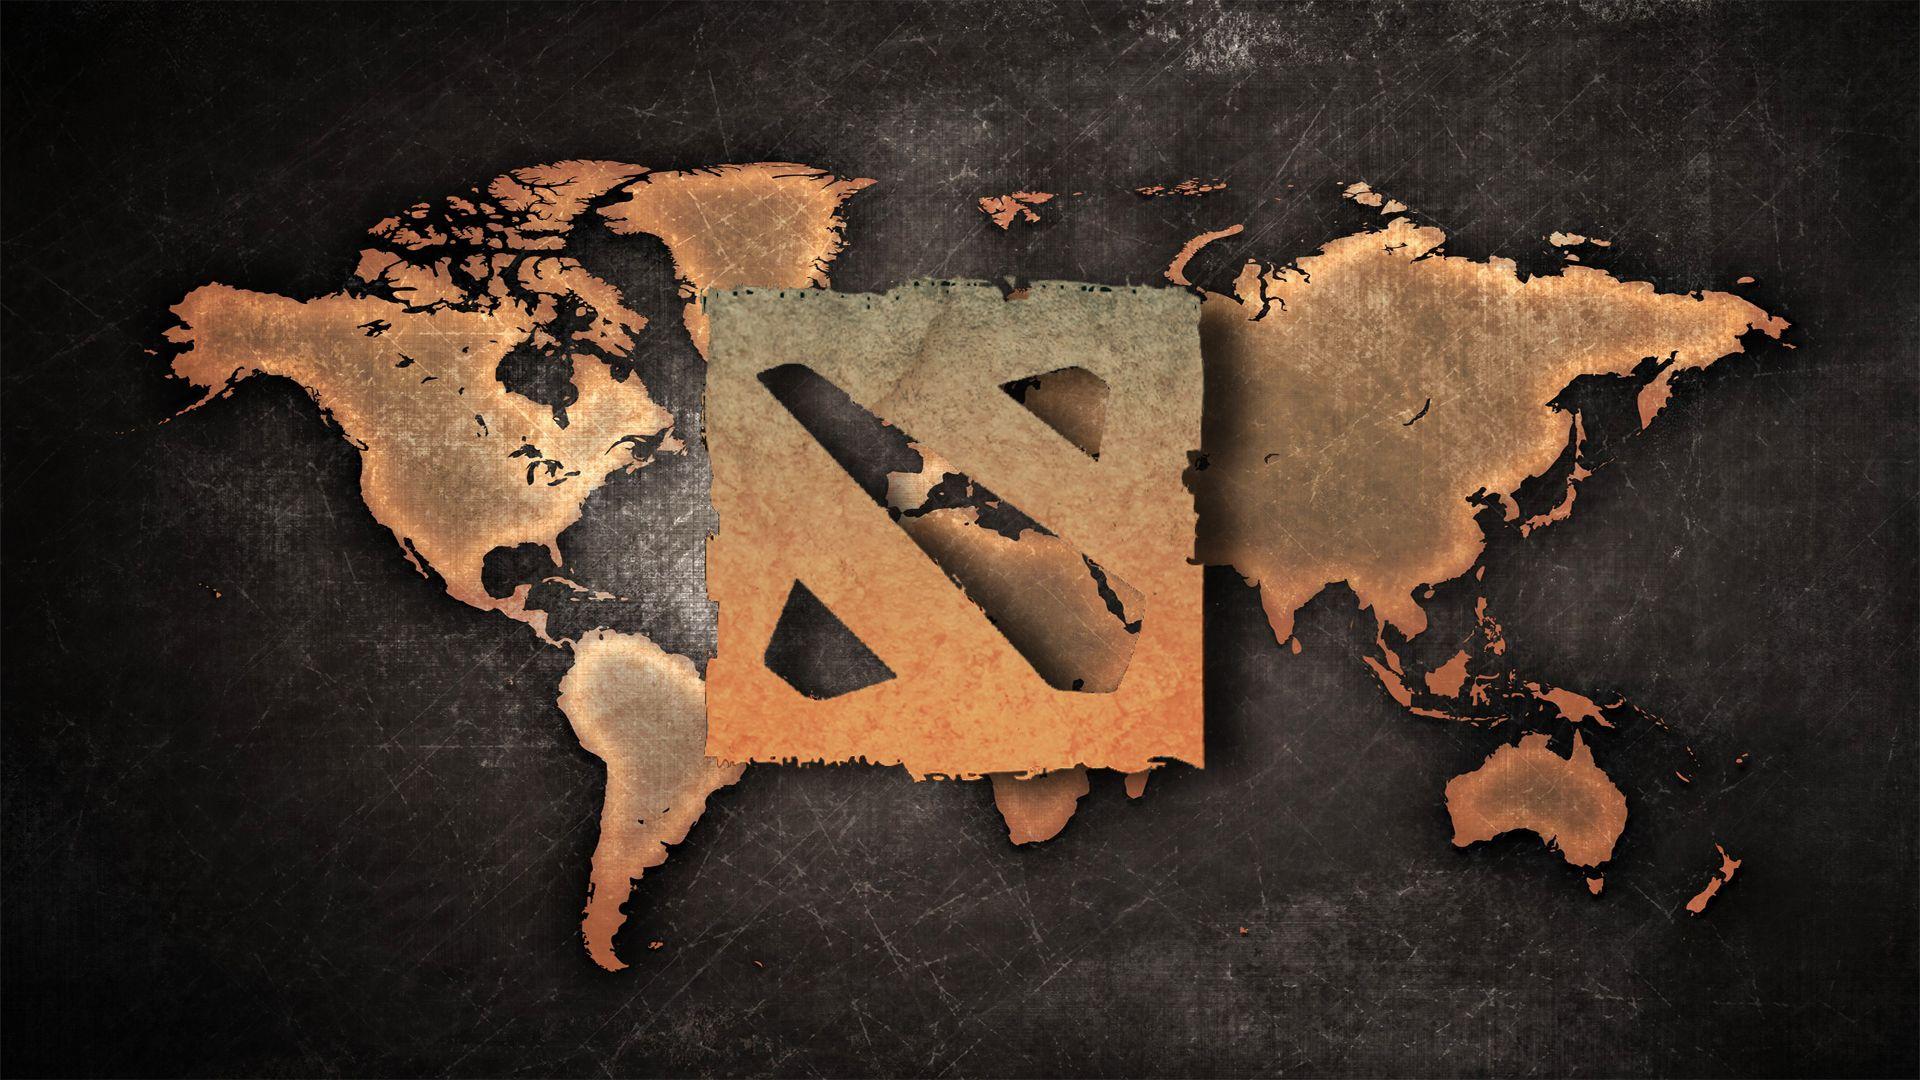 Dota 2 World Map Wallpaper More Httpdota2wallscom